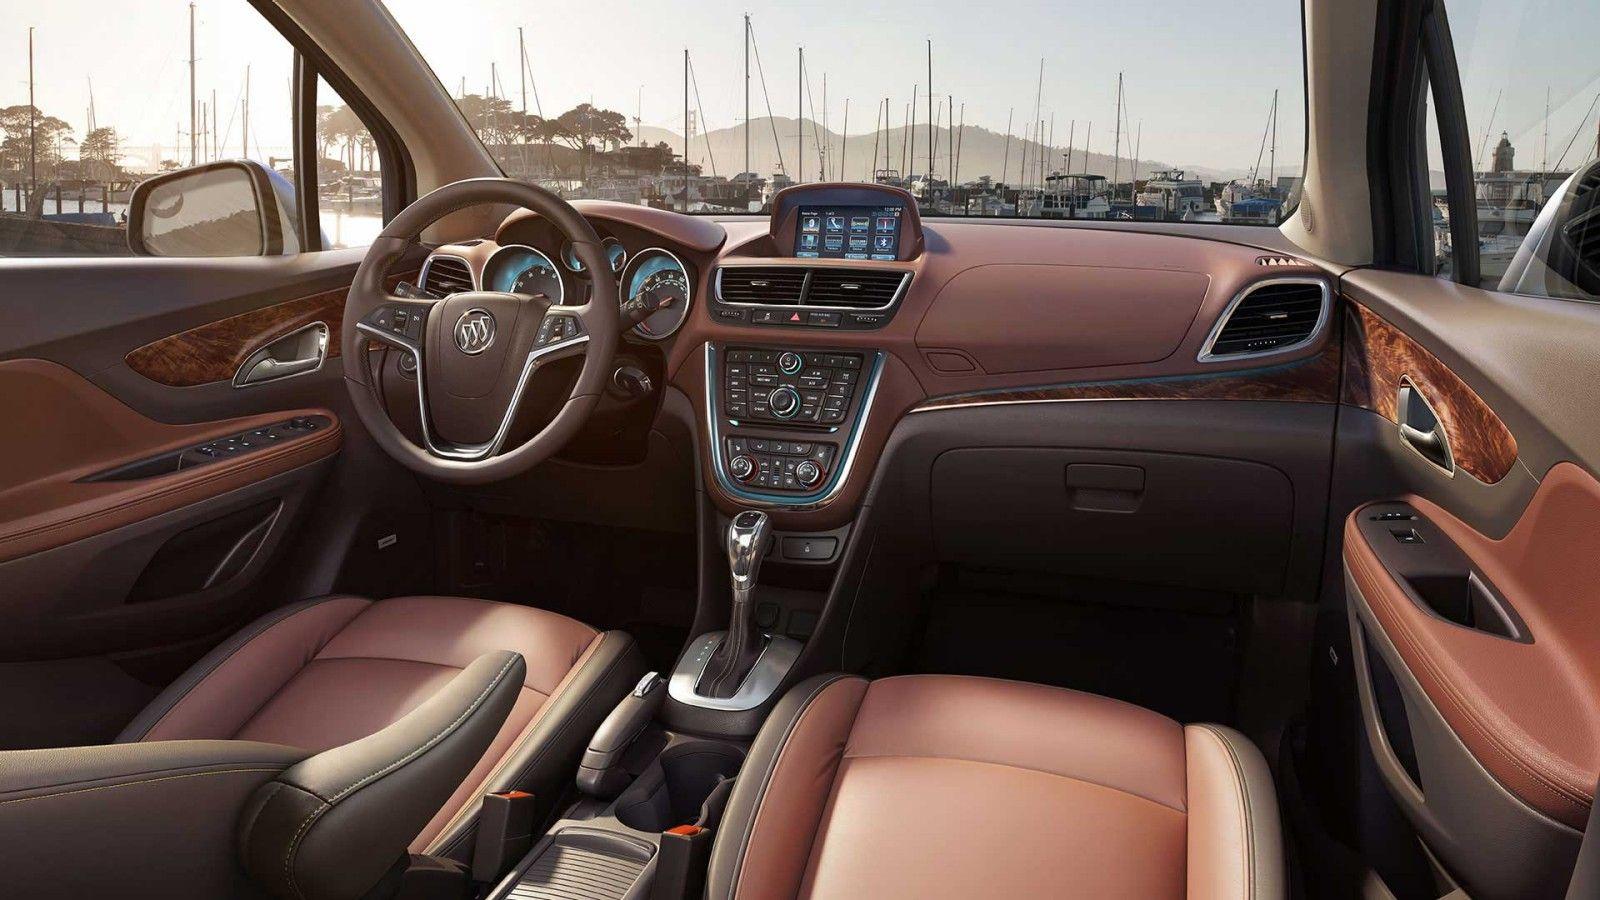 2014 Buick Encore Luxury Crossover Interior Photos Http Www Penskebuickgmc Com Models Buick Encore Buick Encore Buick 2015 Buick